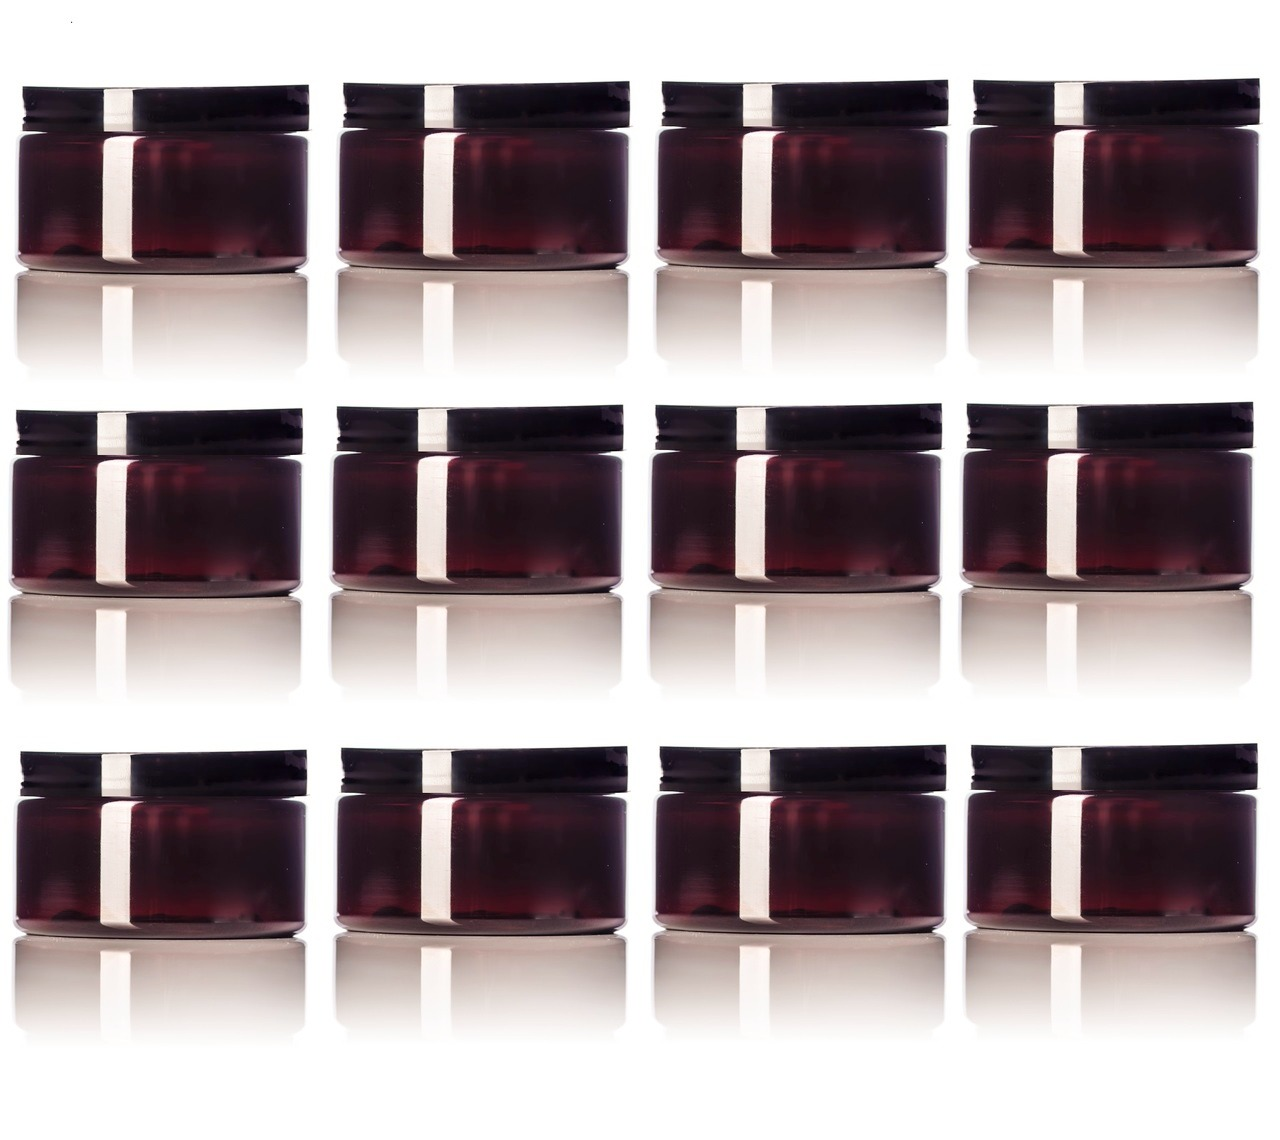 Amber Packaging - $15.00 per order